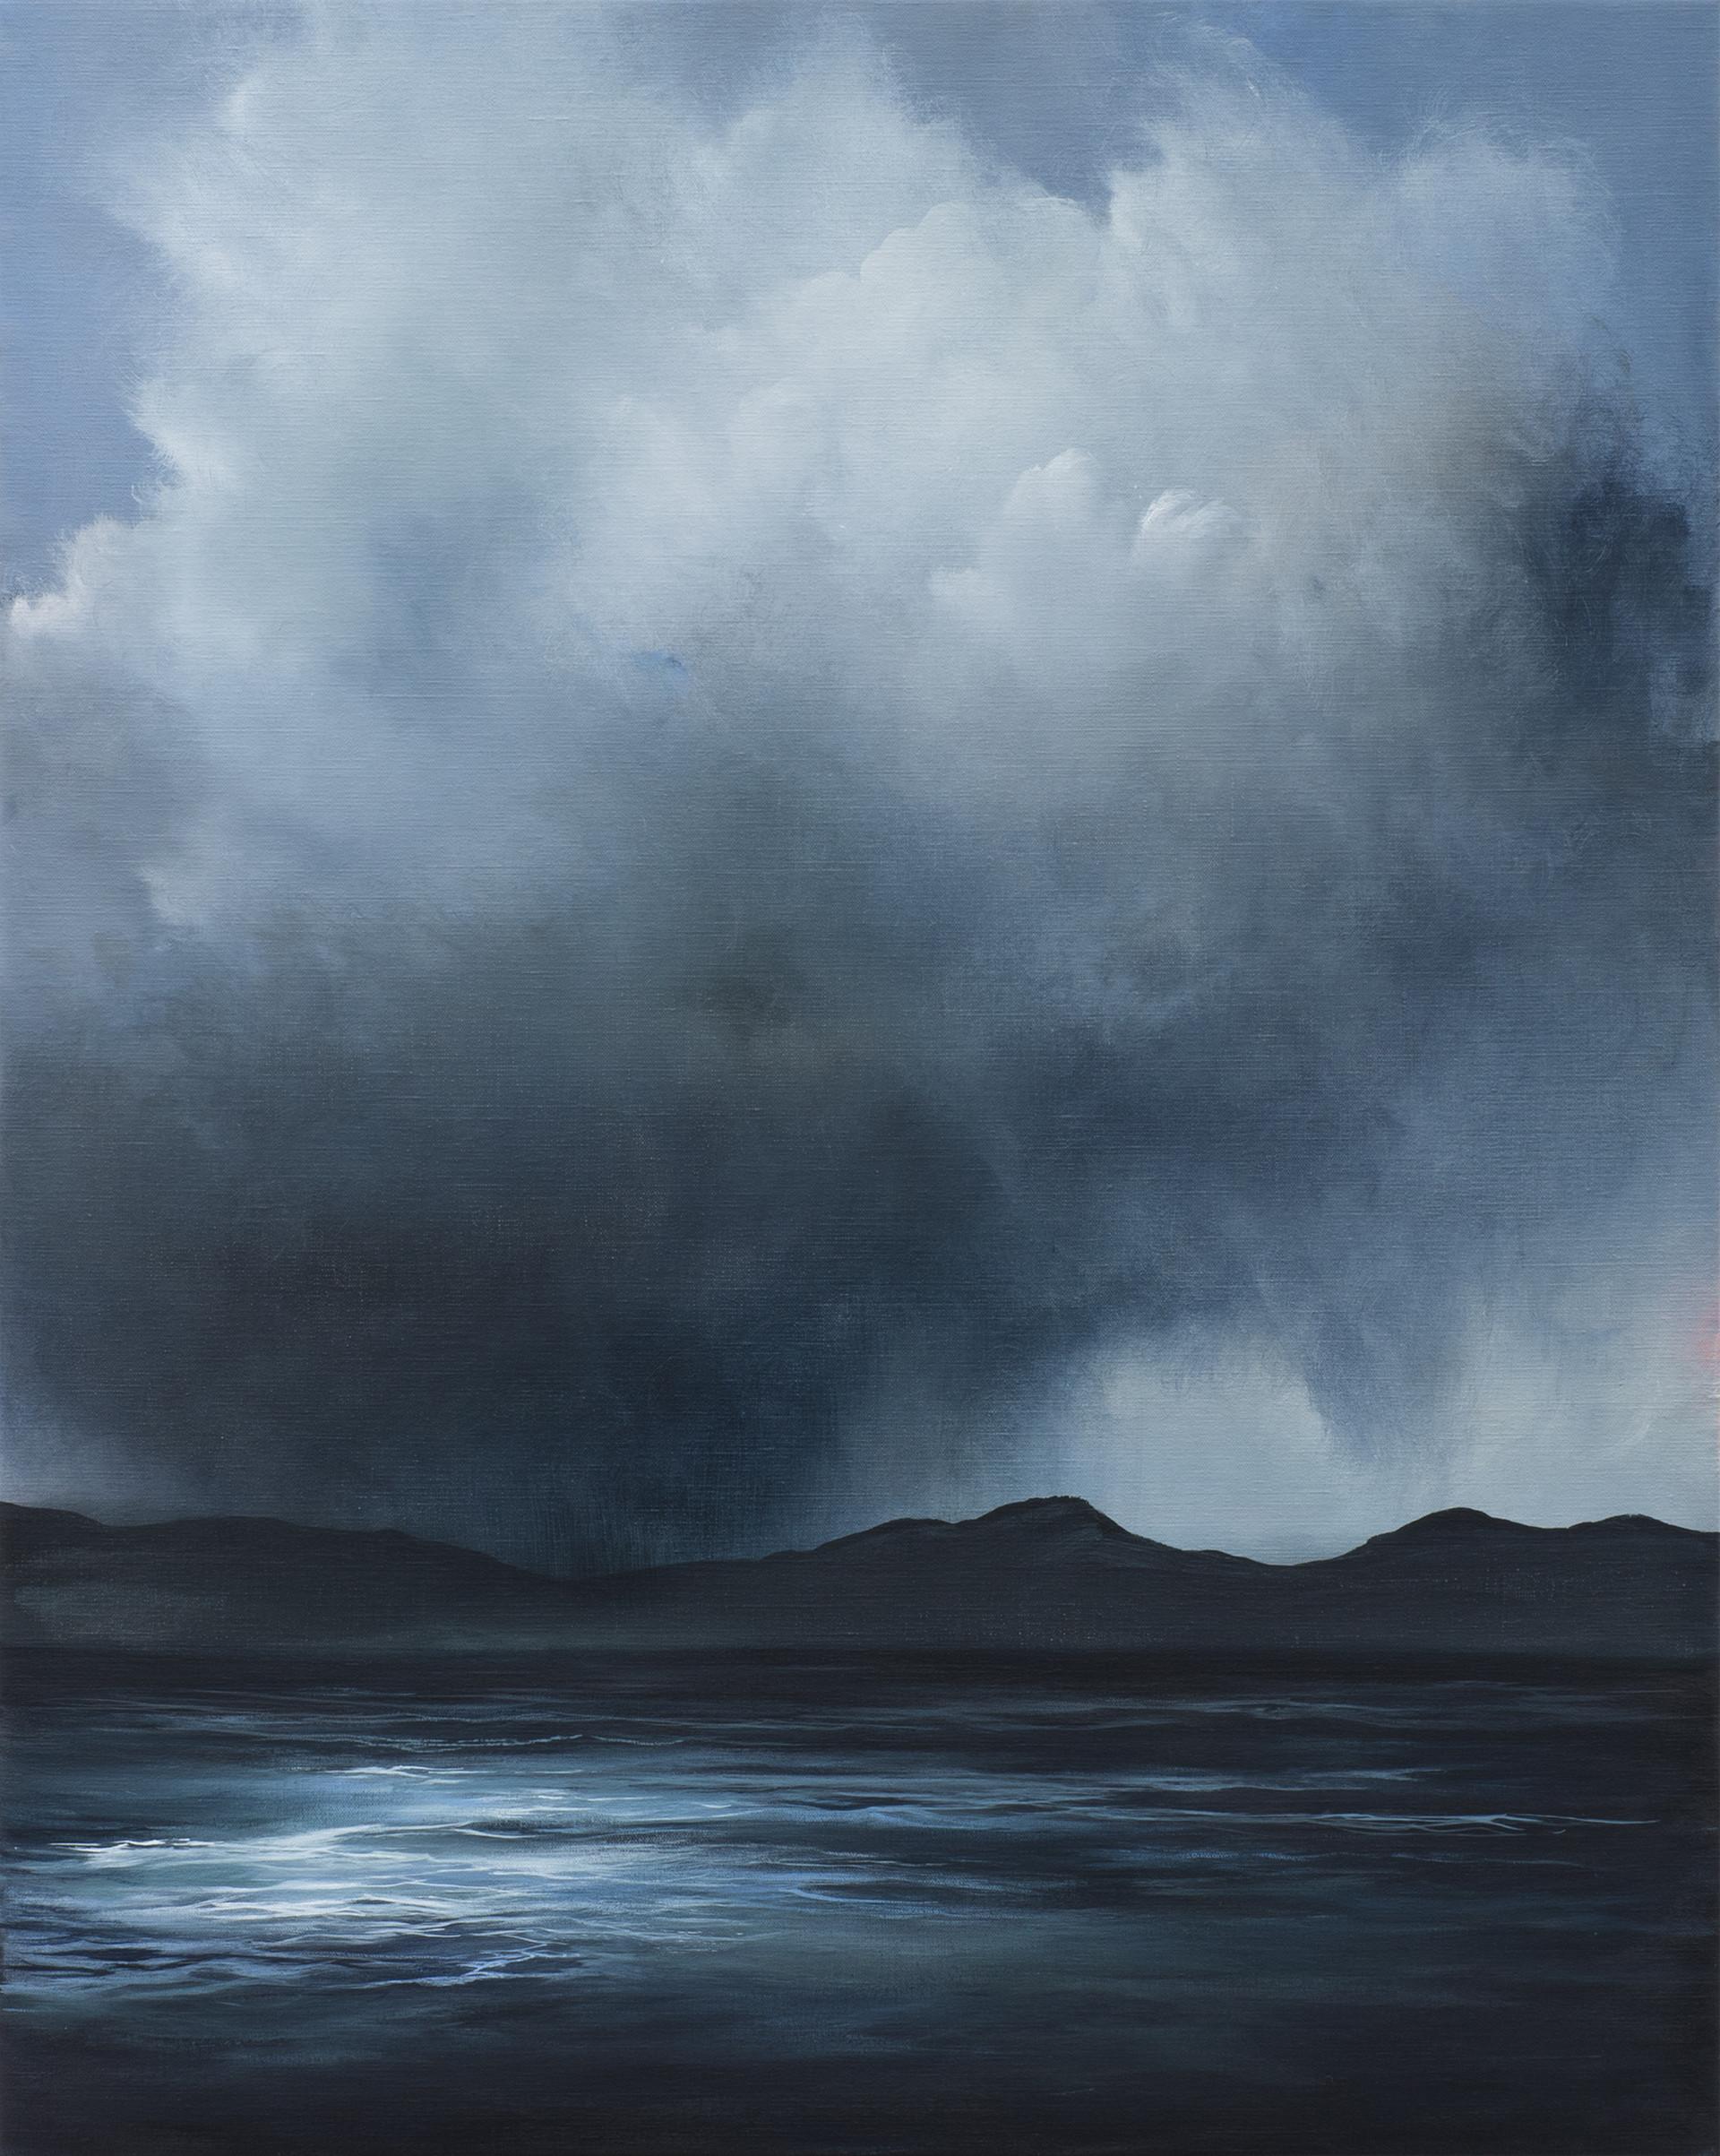 clouded judgement | acrylic on belgian linen , 102cm x 82cm | sold